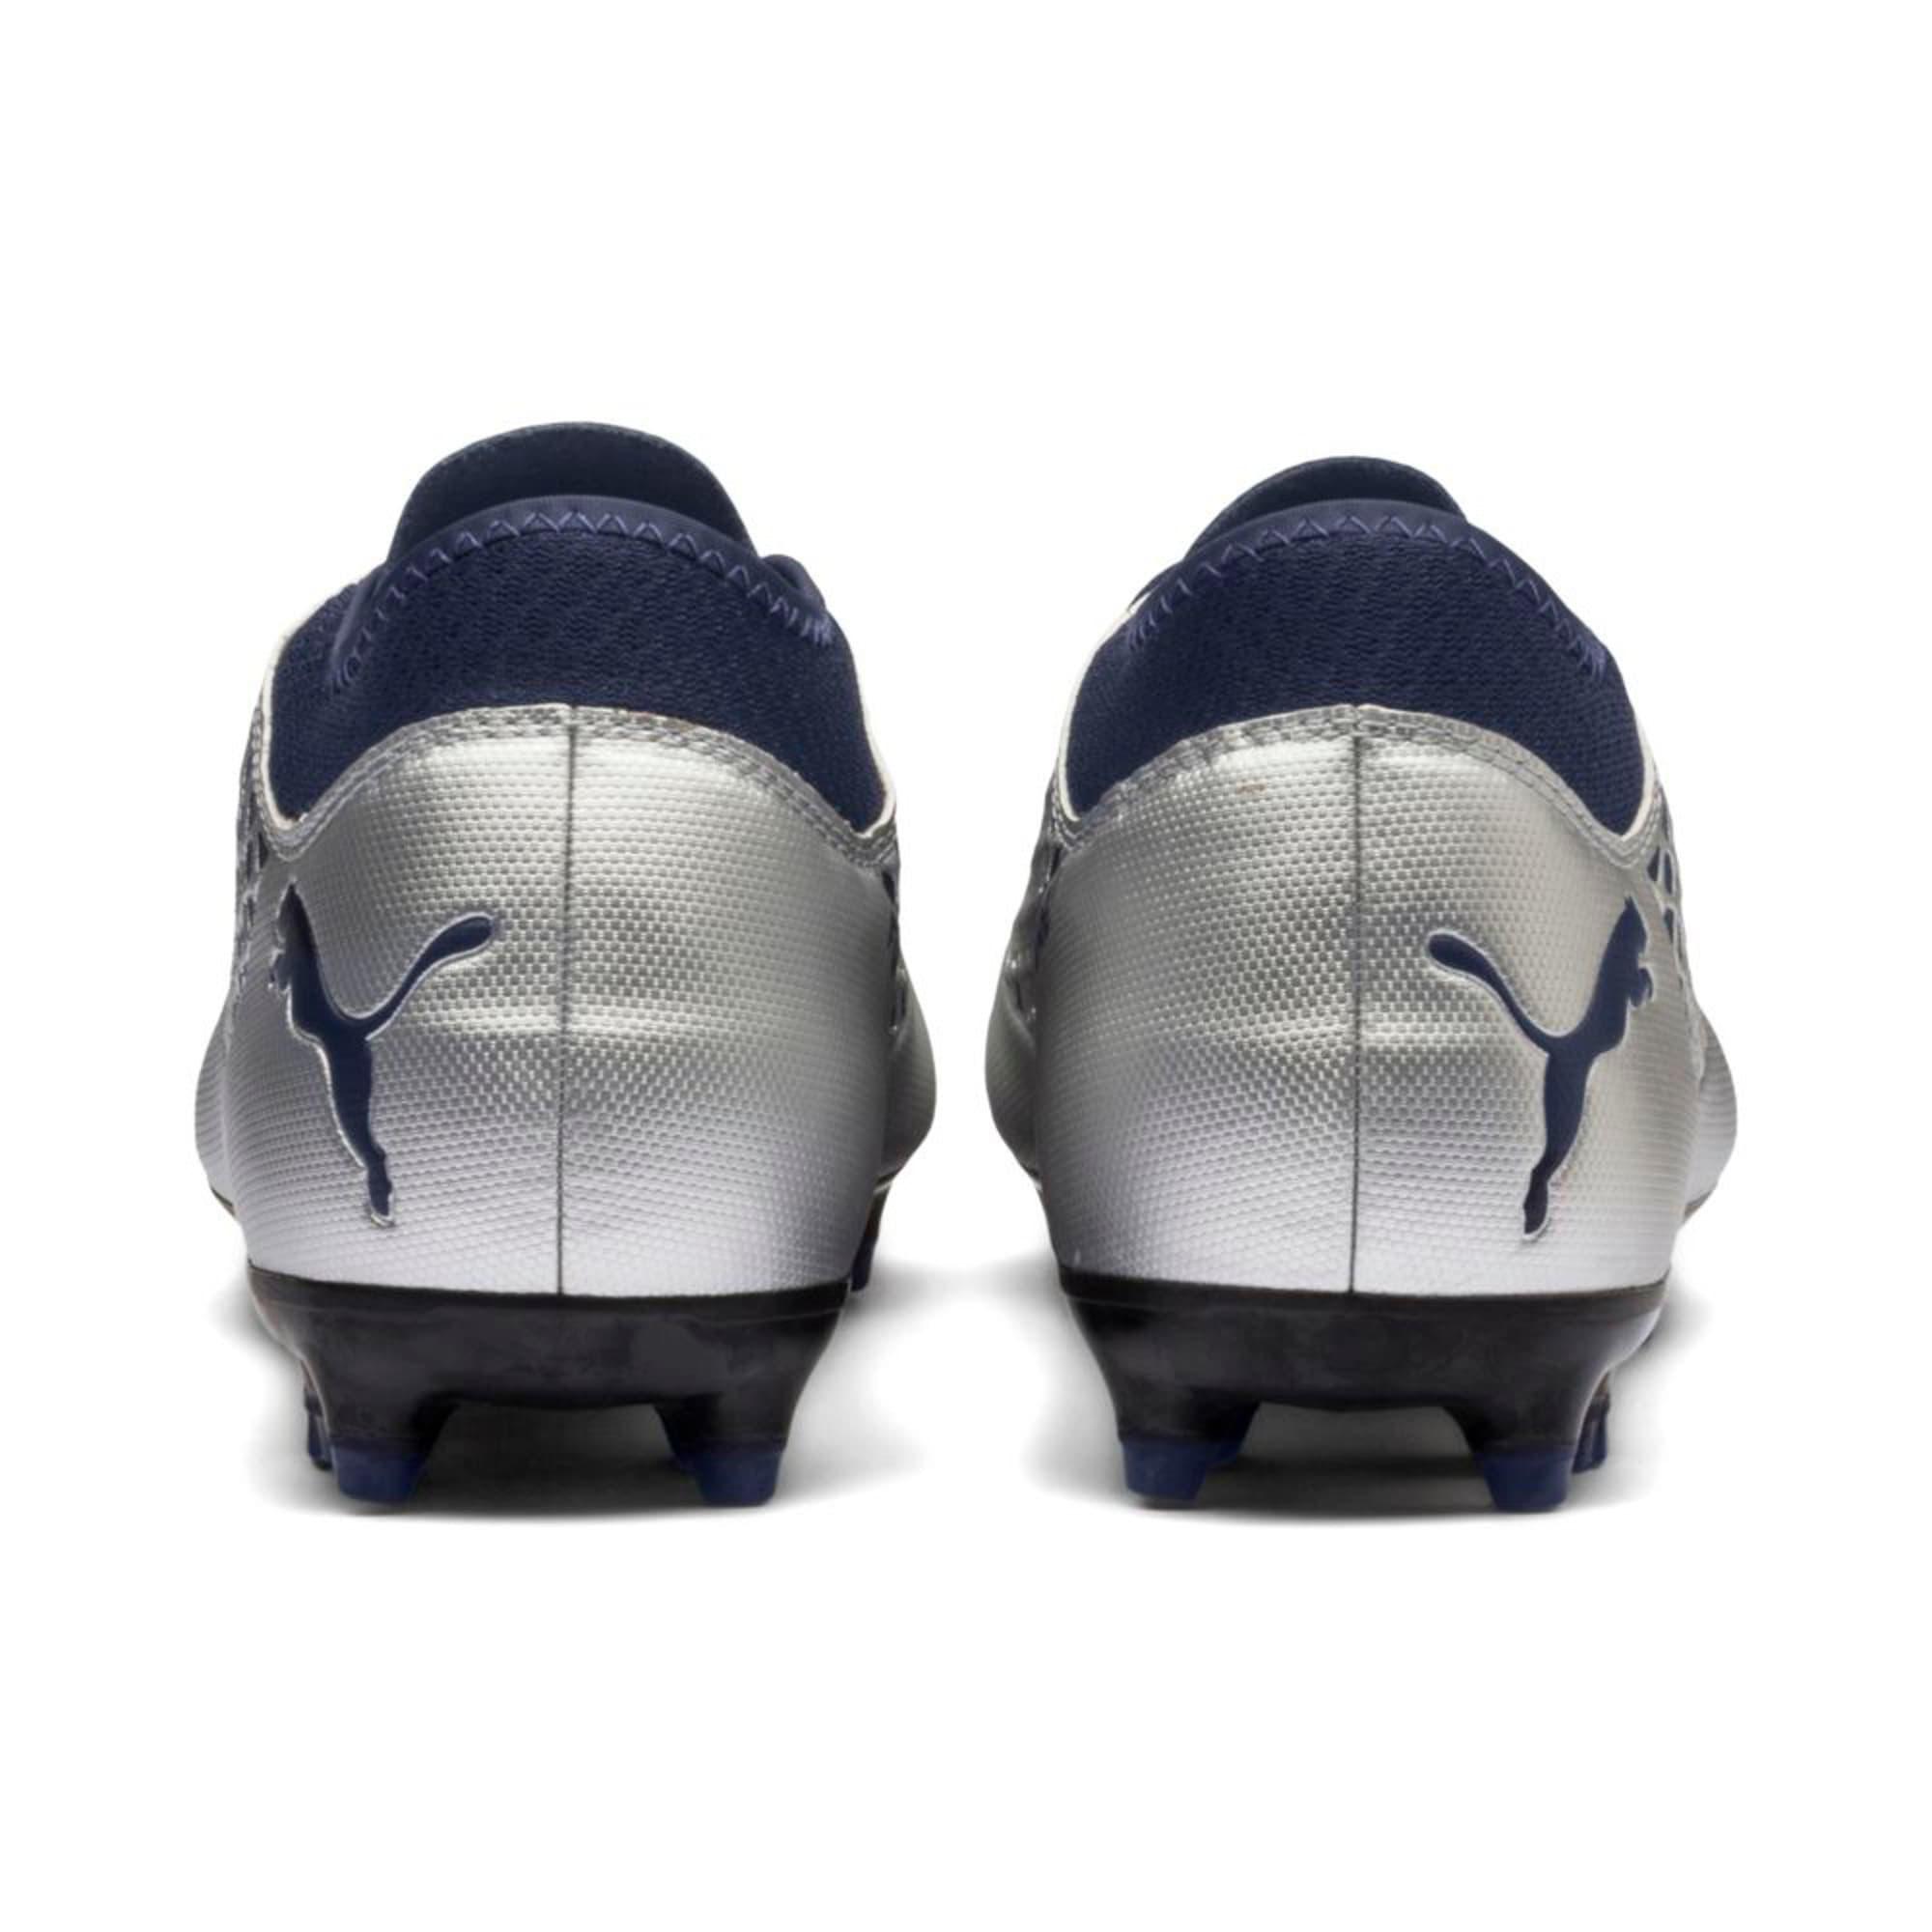 Thumbnail 4 of FUTURE 2.4 FG/AG Men's Football Boots, Puma Silver-Peacoat, medium-IND